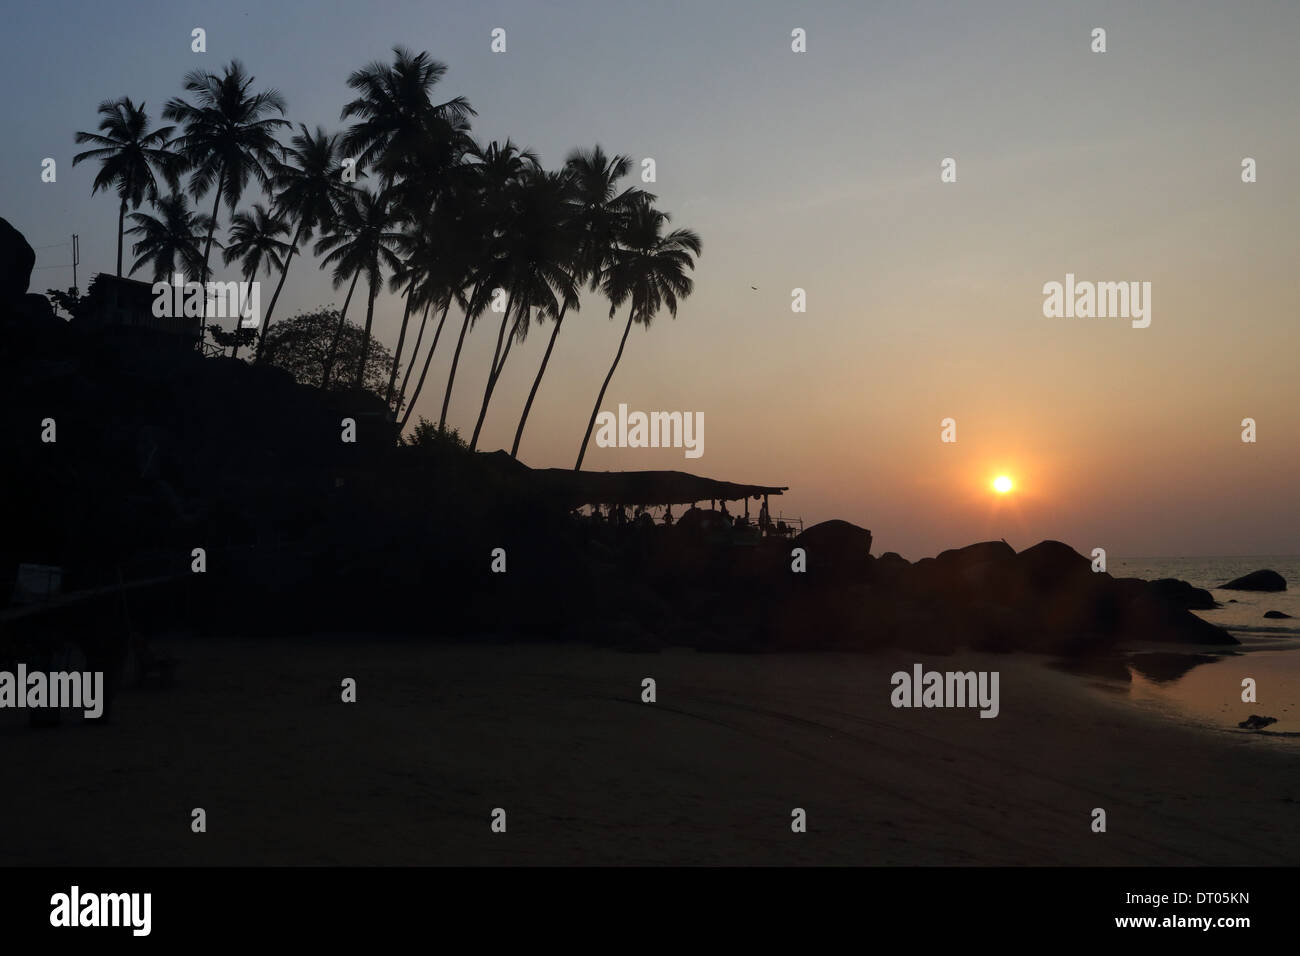 Palolem Beach in Goa, Indien, Süd Indien Foto: Pixstory / Alamy Stockbild